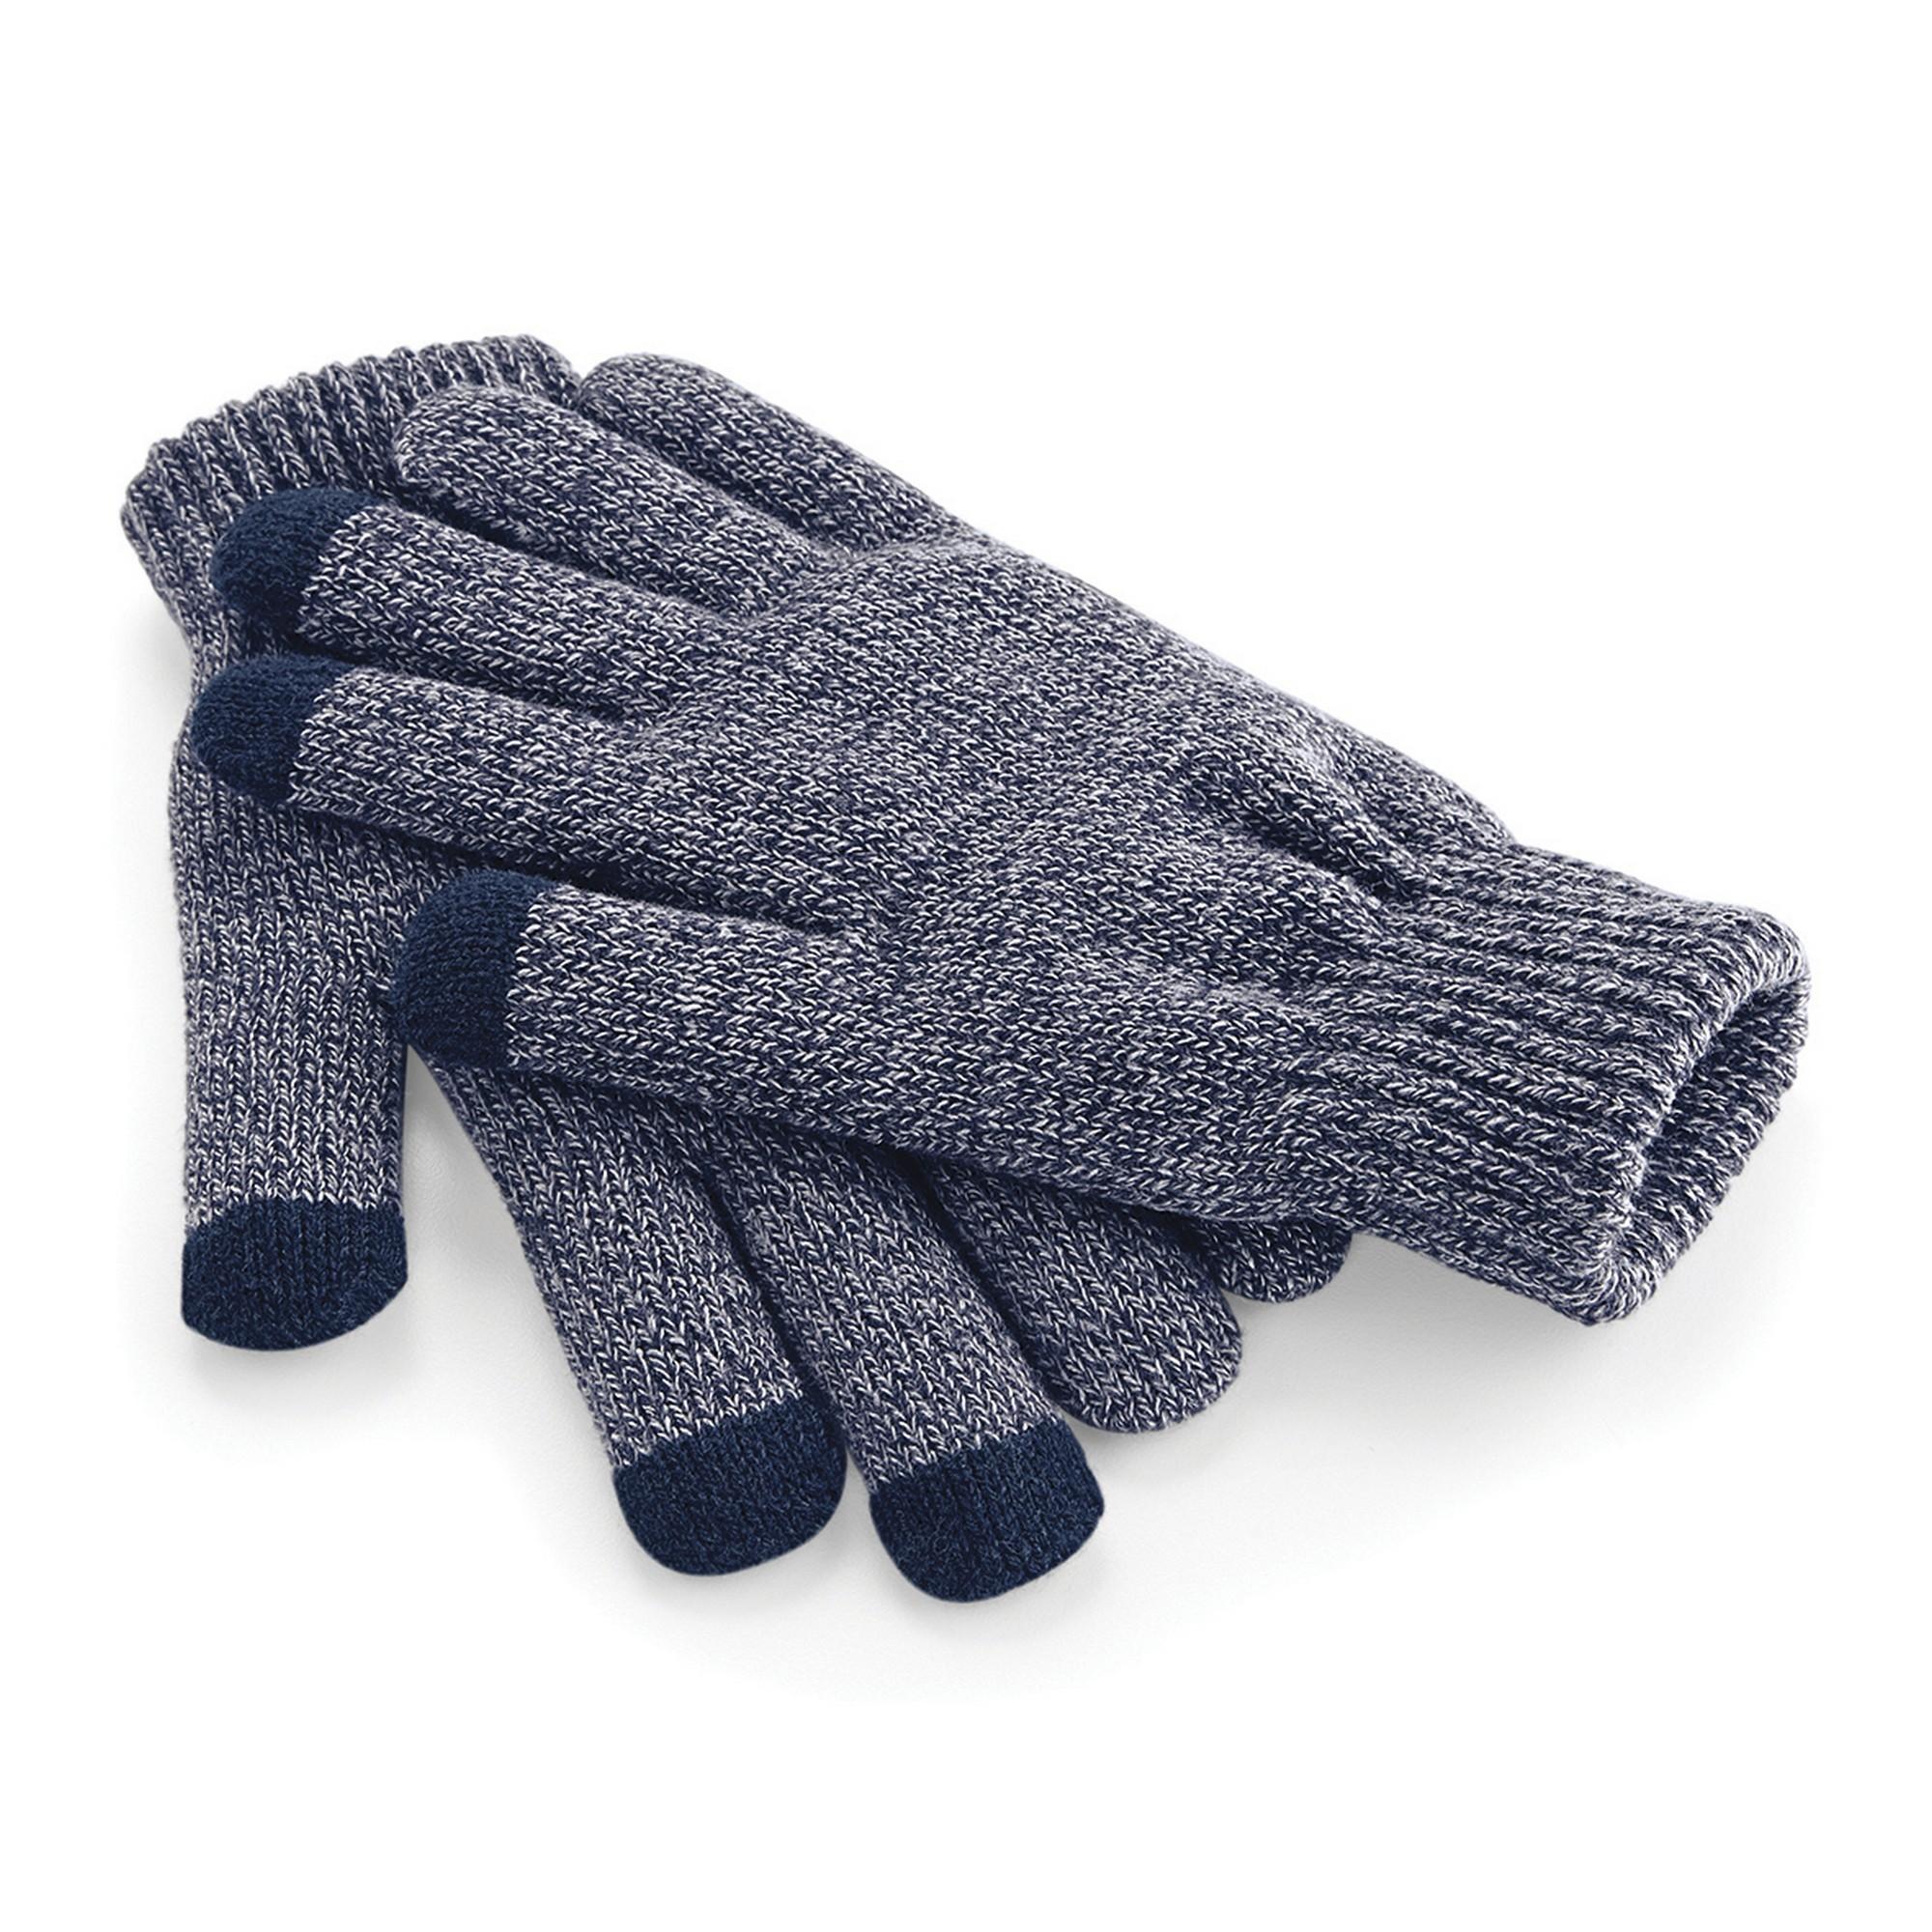 Beechfield-Unisex-Touchscreen-Smart-Phone-IPhone-IPad-Winter-Gloves-RW253 thumbnail 6